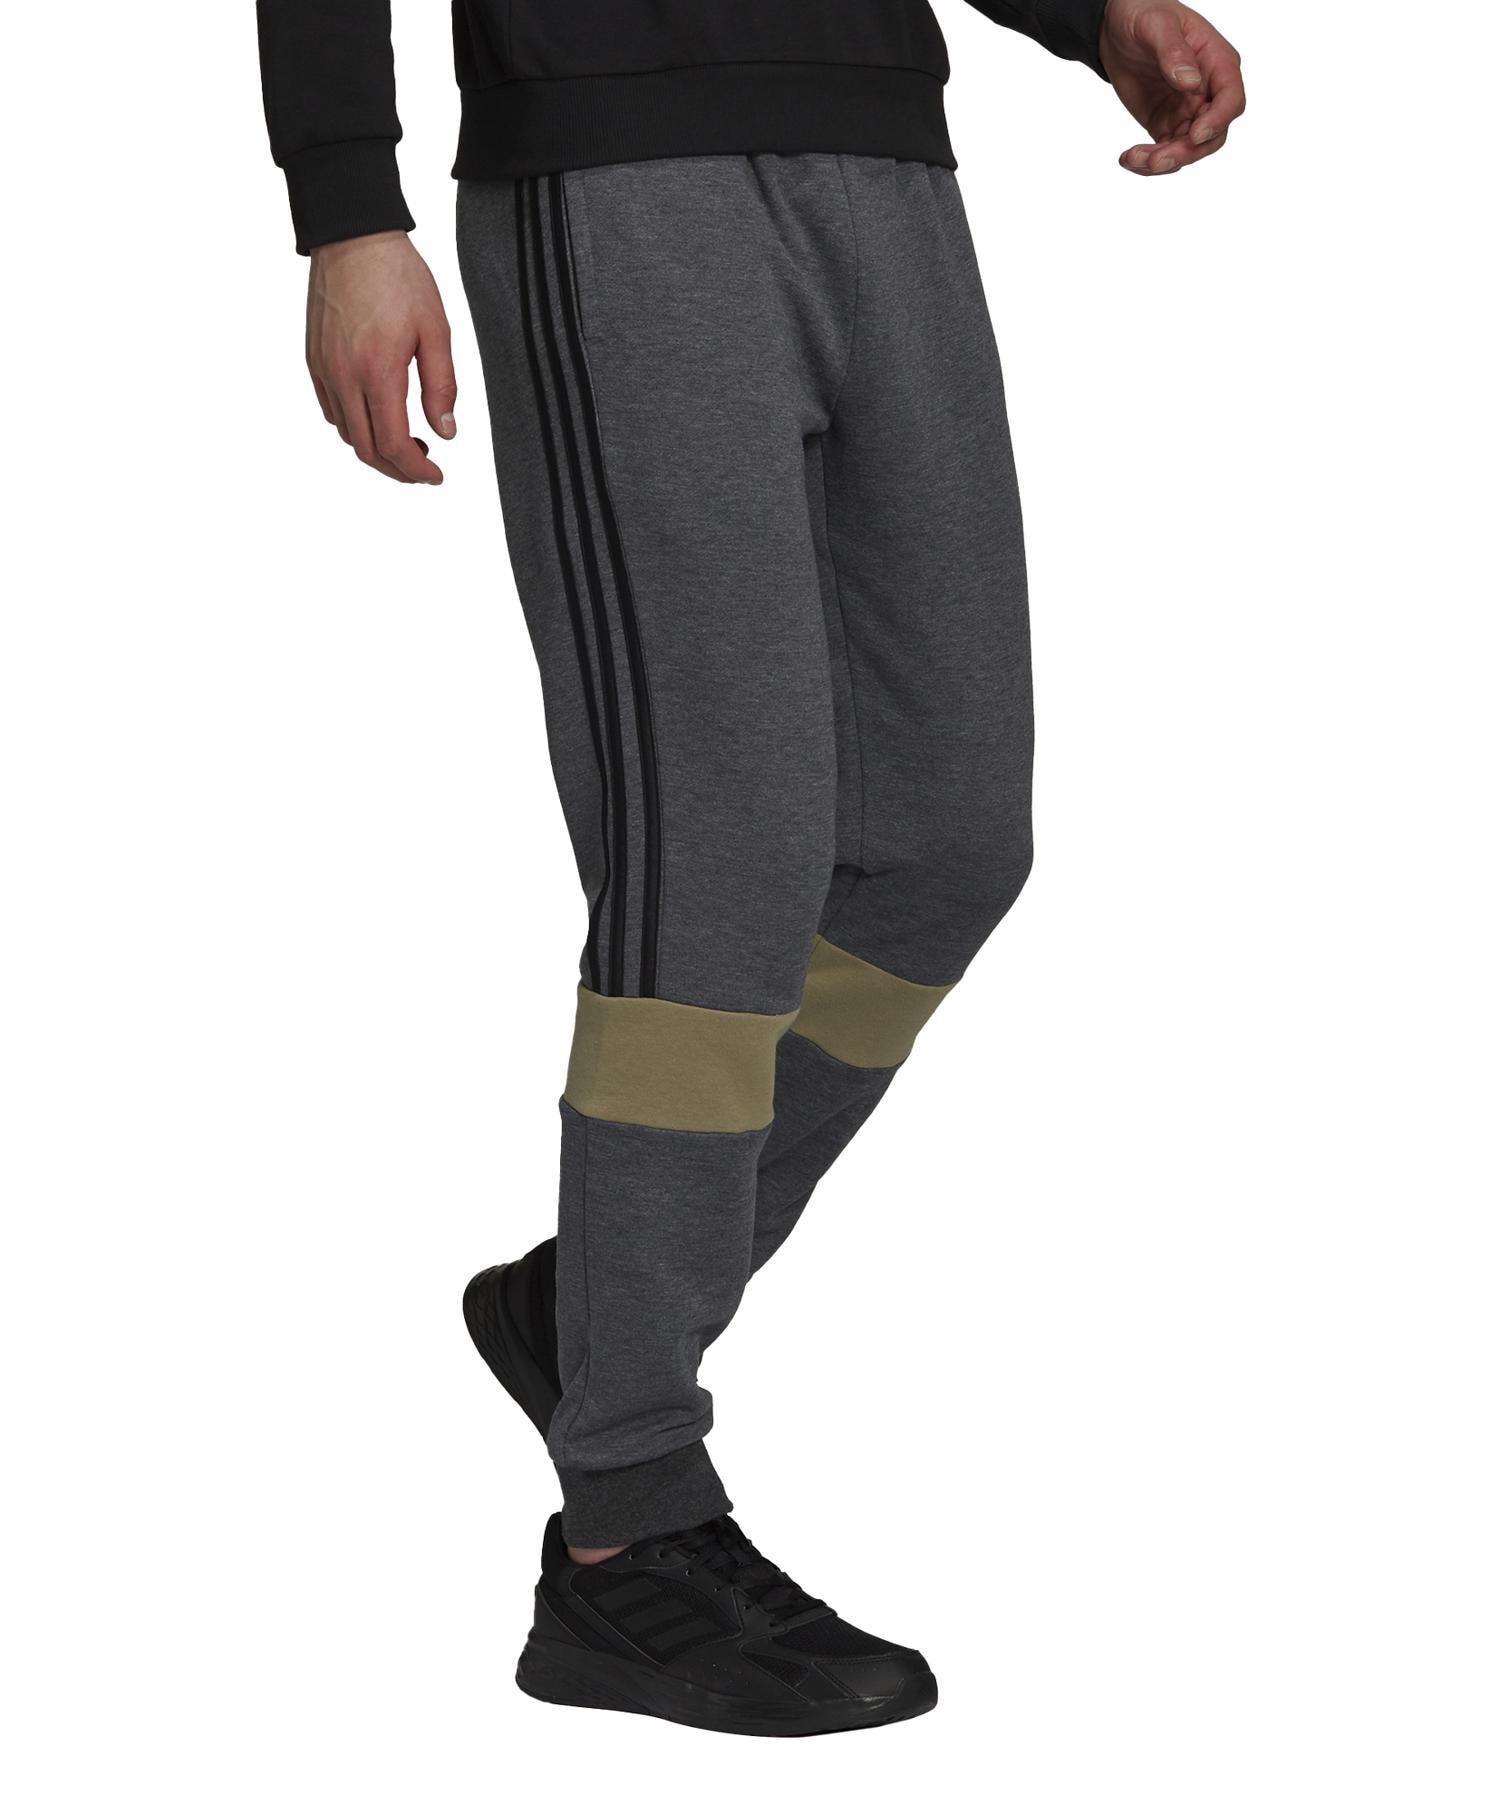 Adidas Colourblock Pant